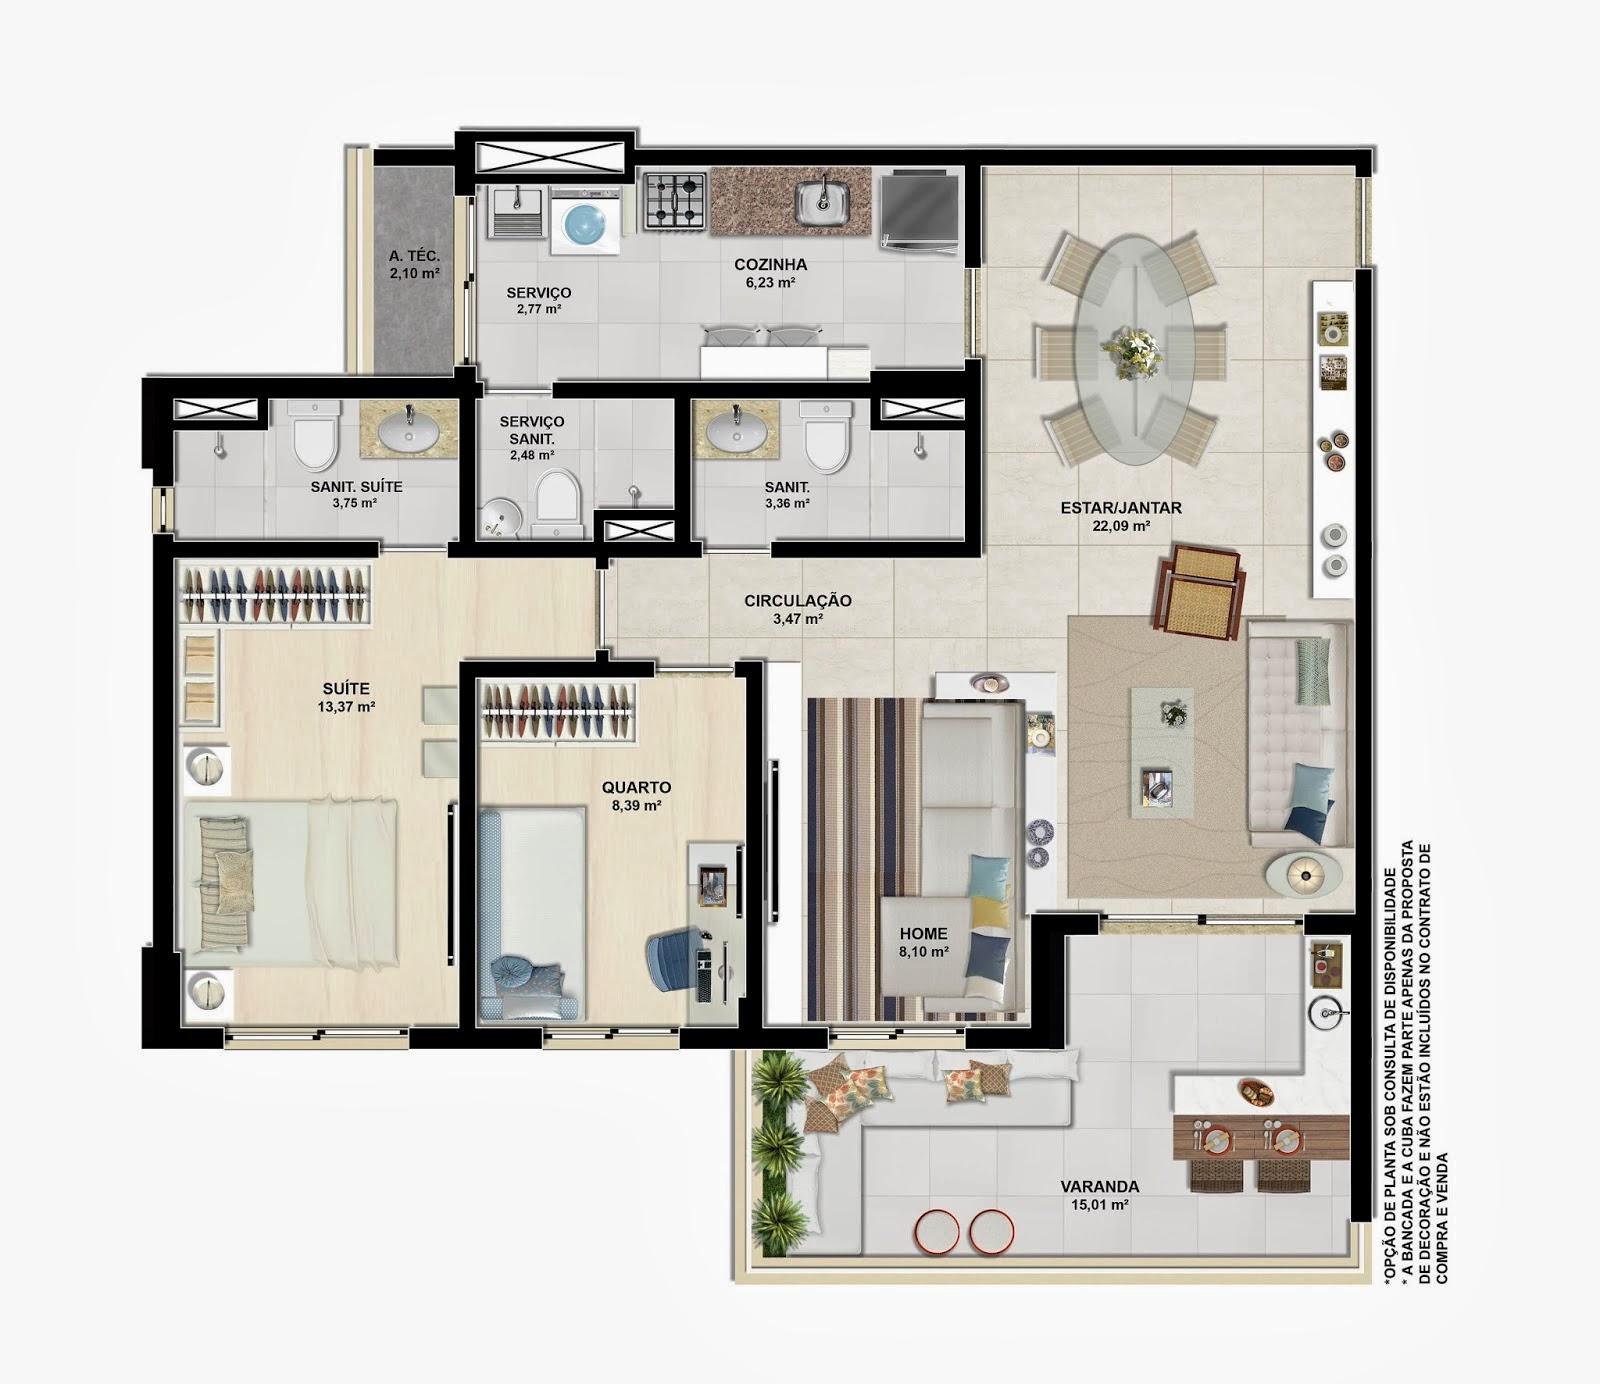 verano residencial - tipo 91m² living ampliado